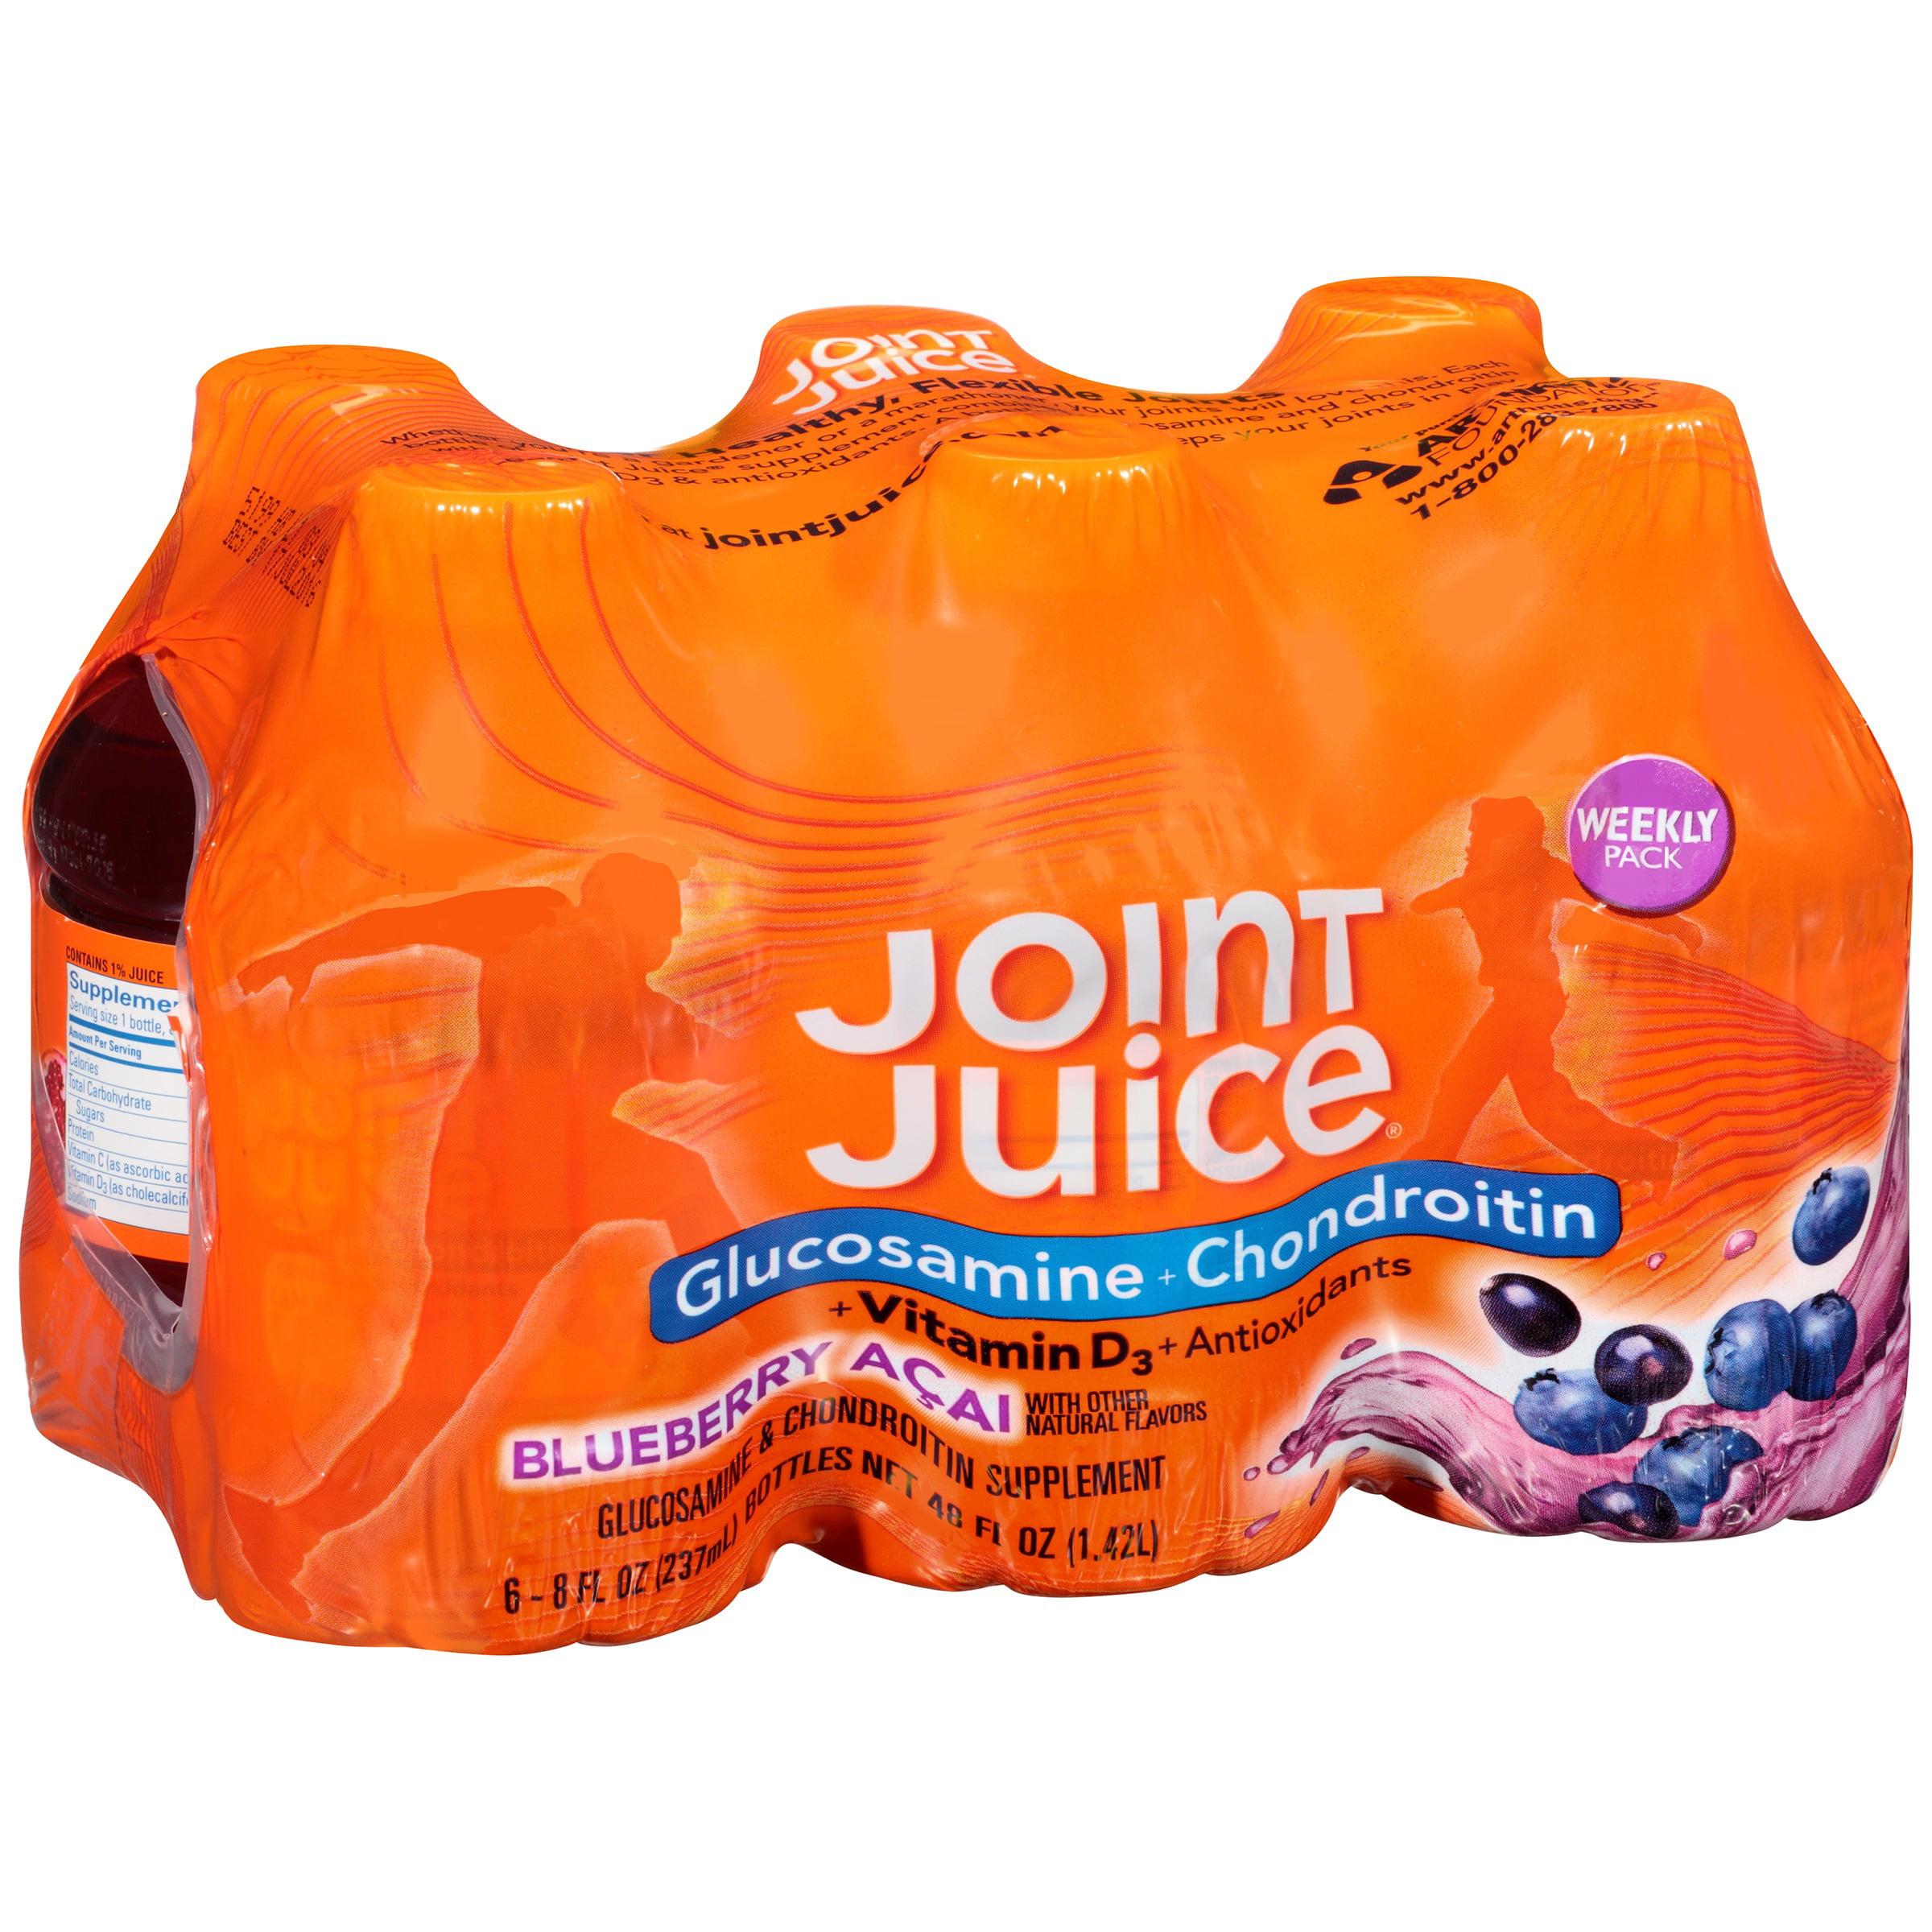 Joint Juice Glucosamine & Chondroitin Supplement, Blueberry Açai, 8 Fl Oz, 6 Ct